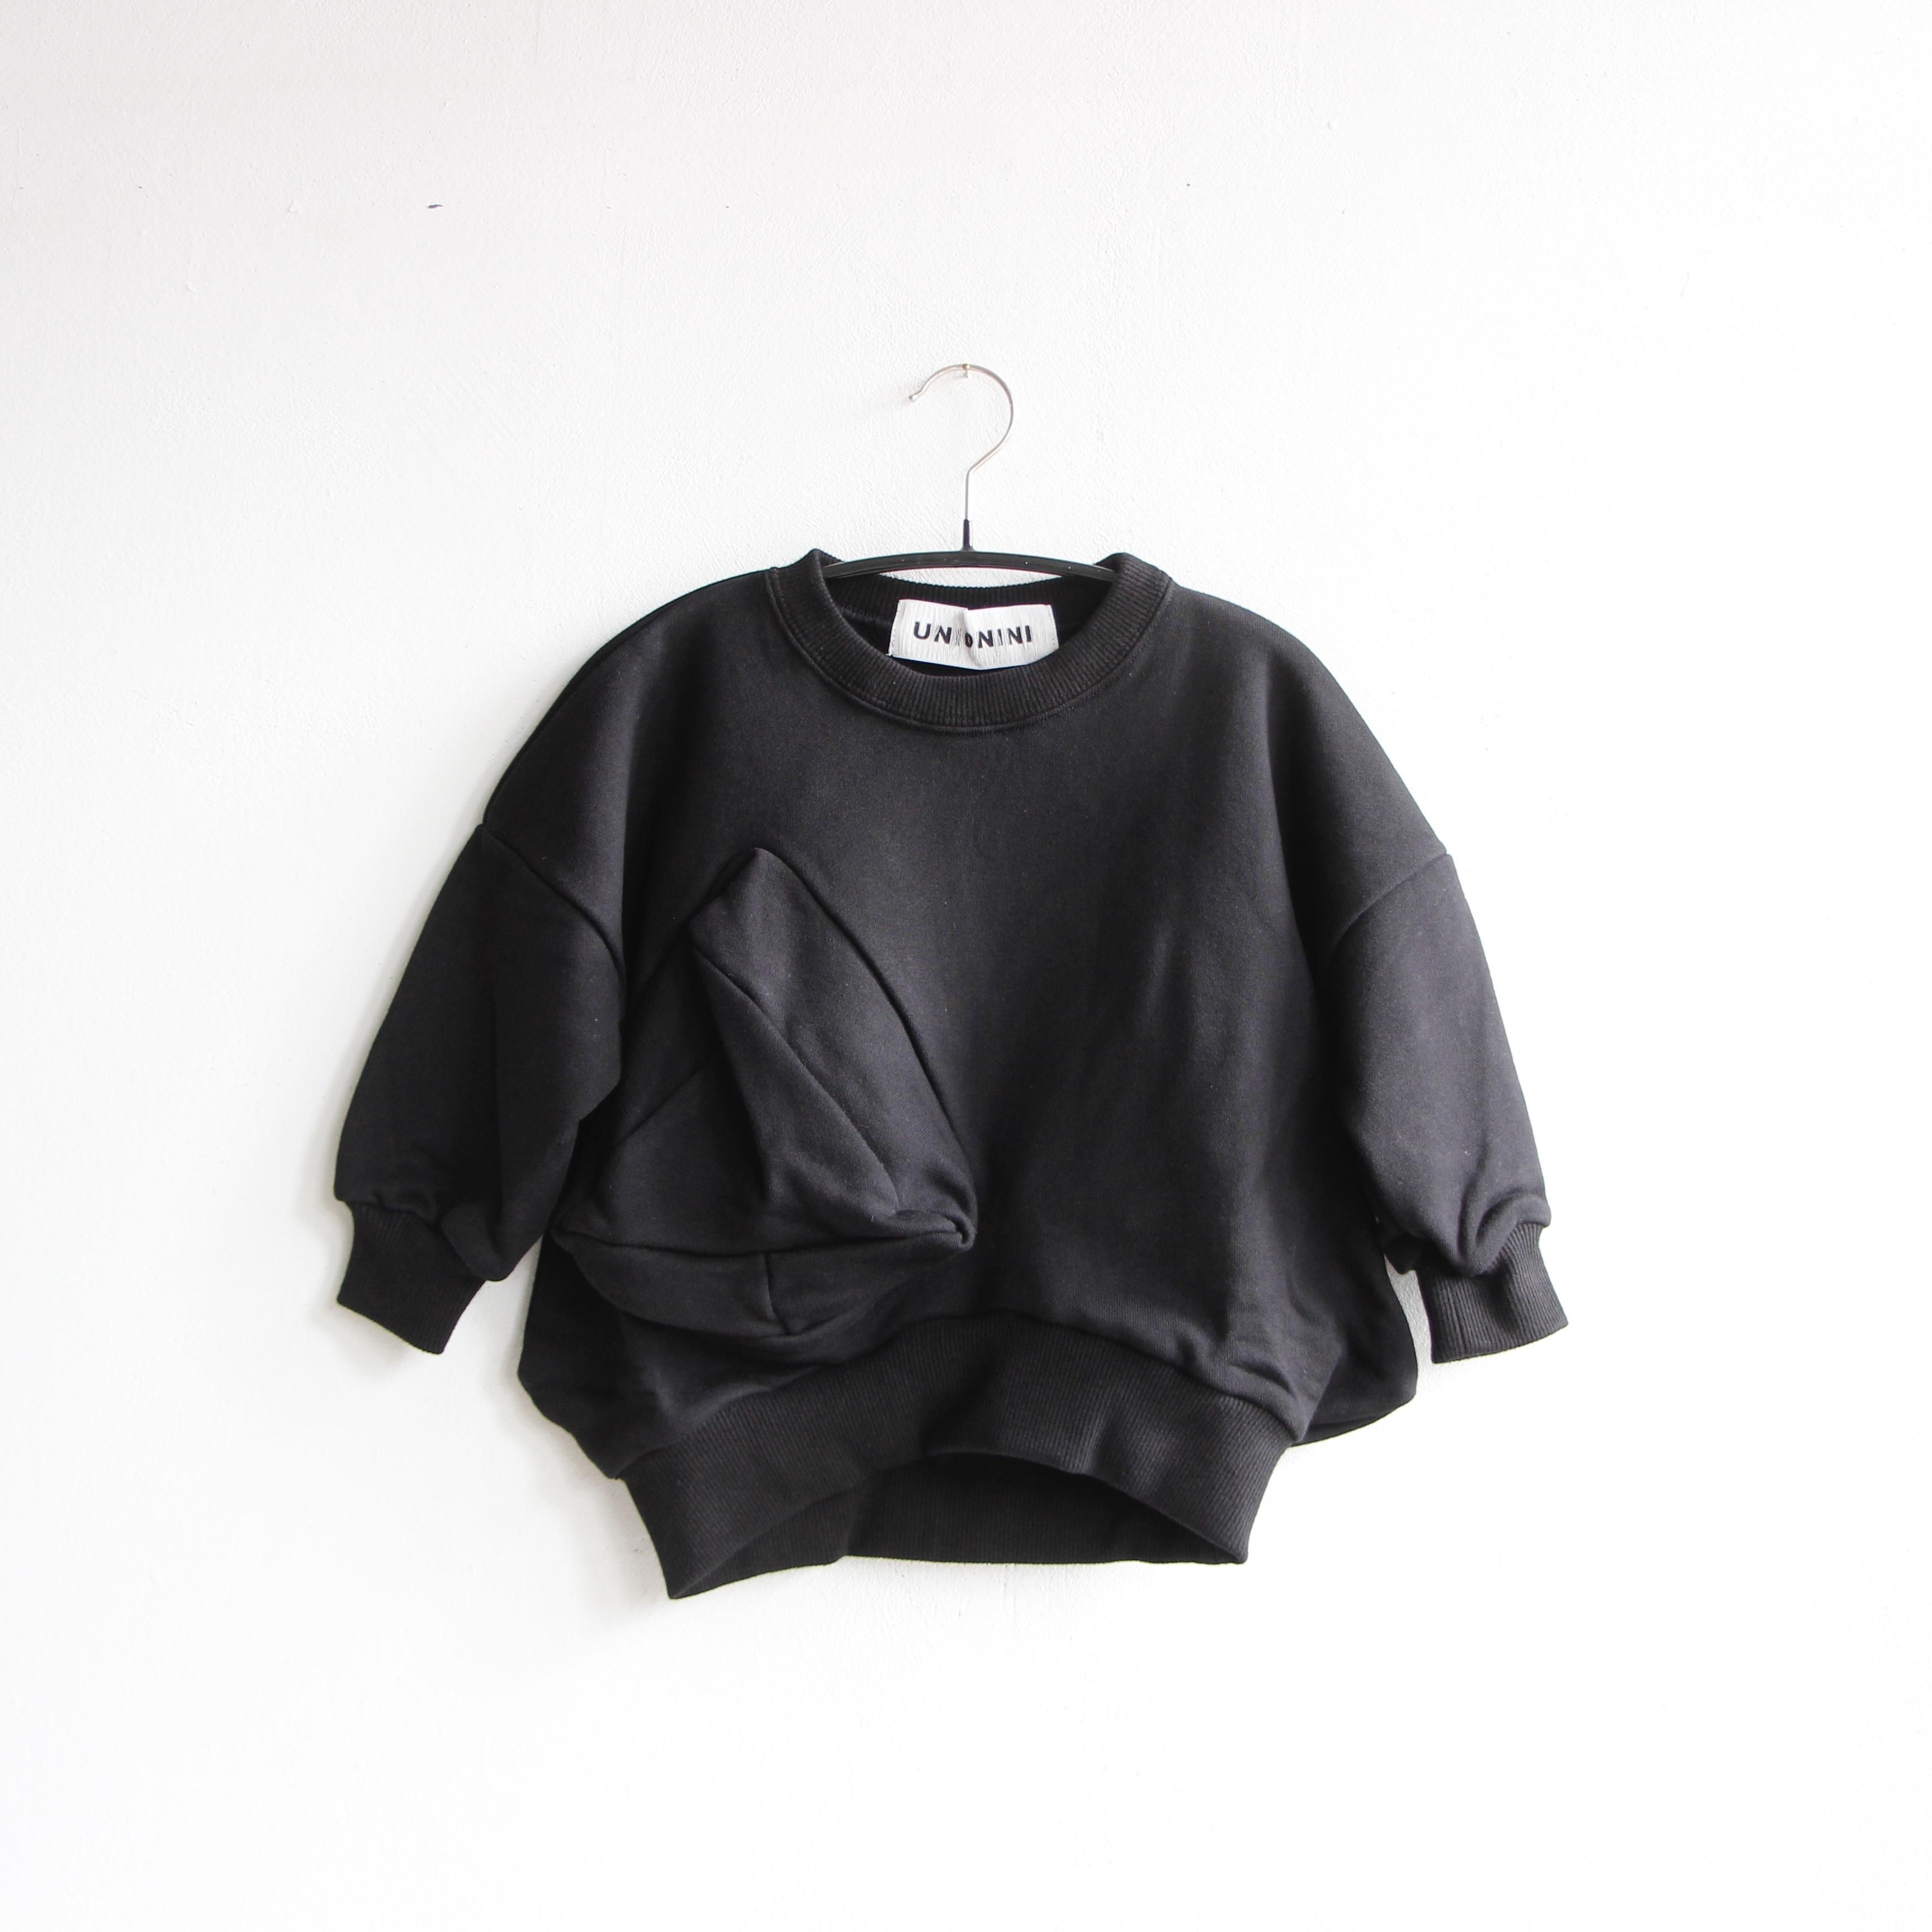 《UNIONINI 2020AW》◯△ sweat shirt / black / 1-12Y